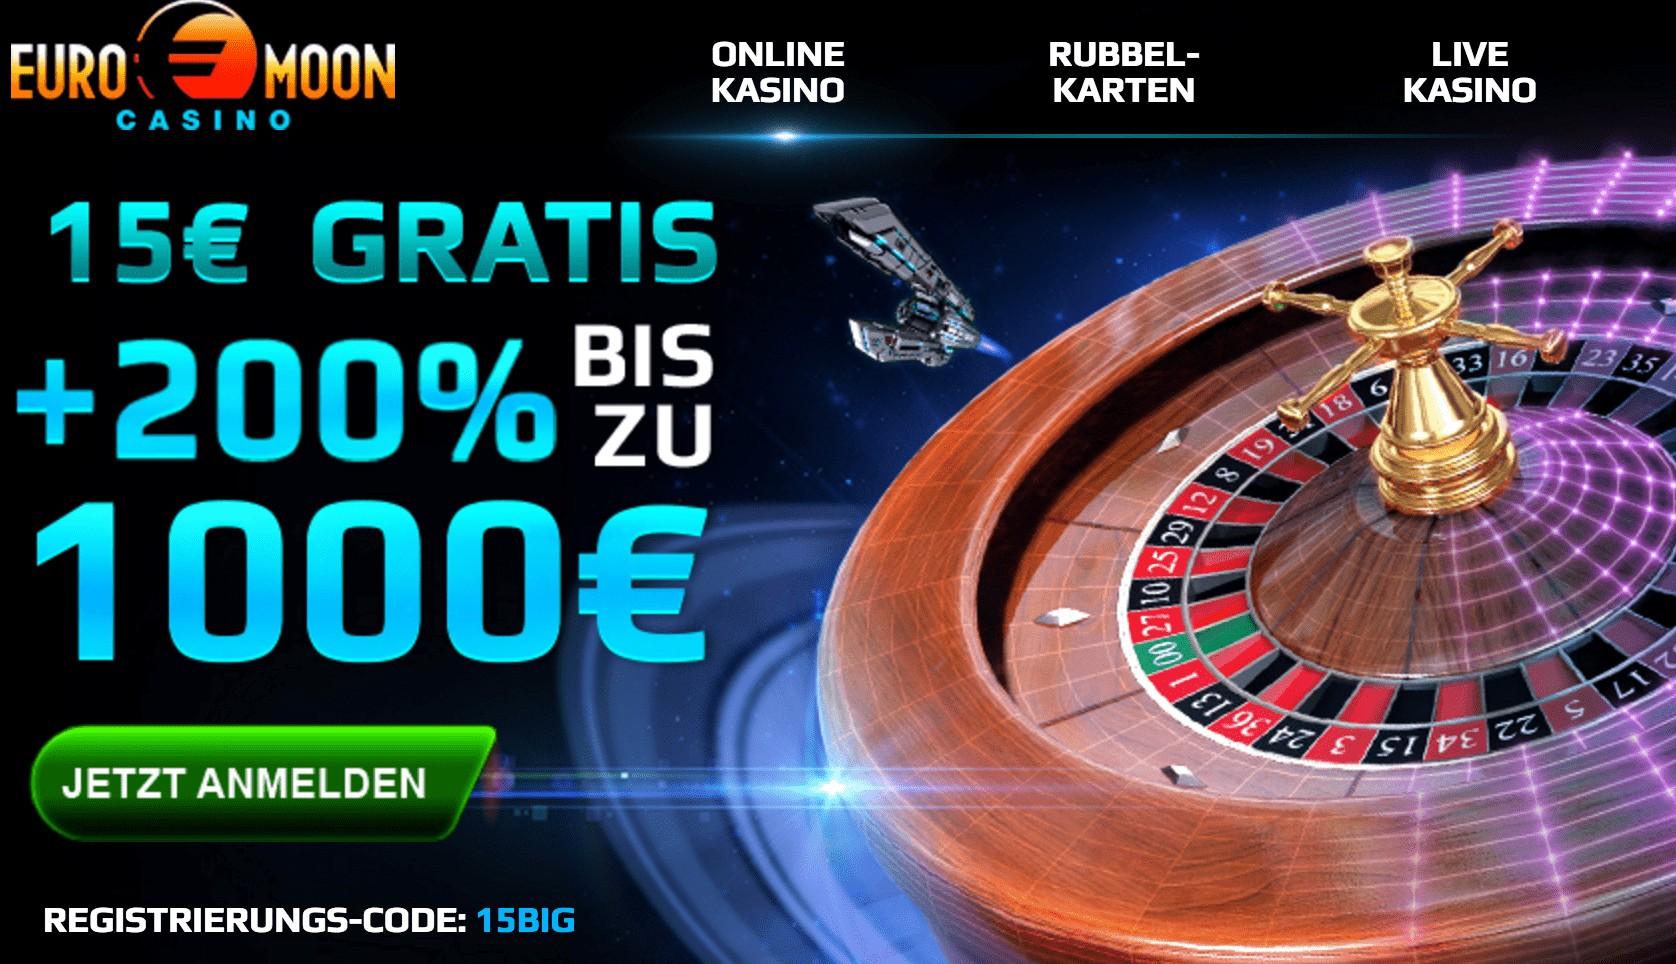 Casino Euro Moon